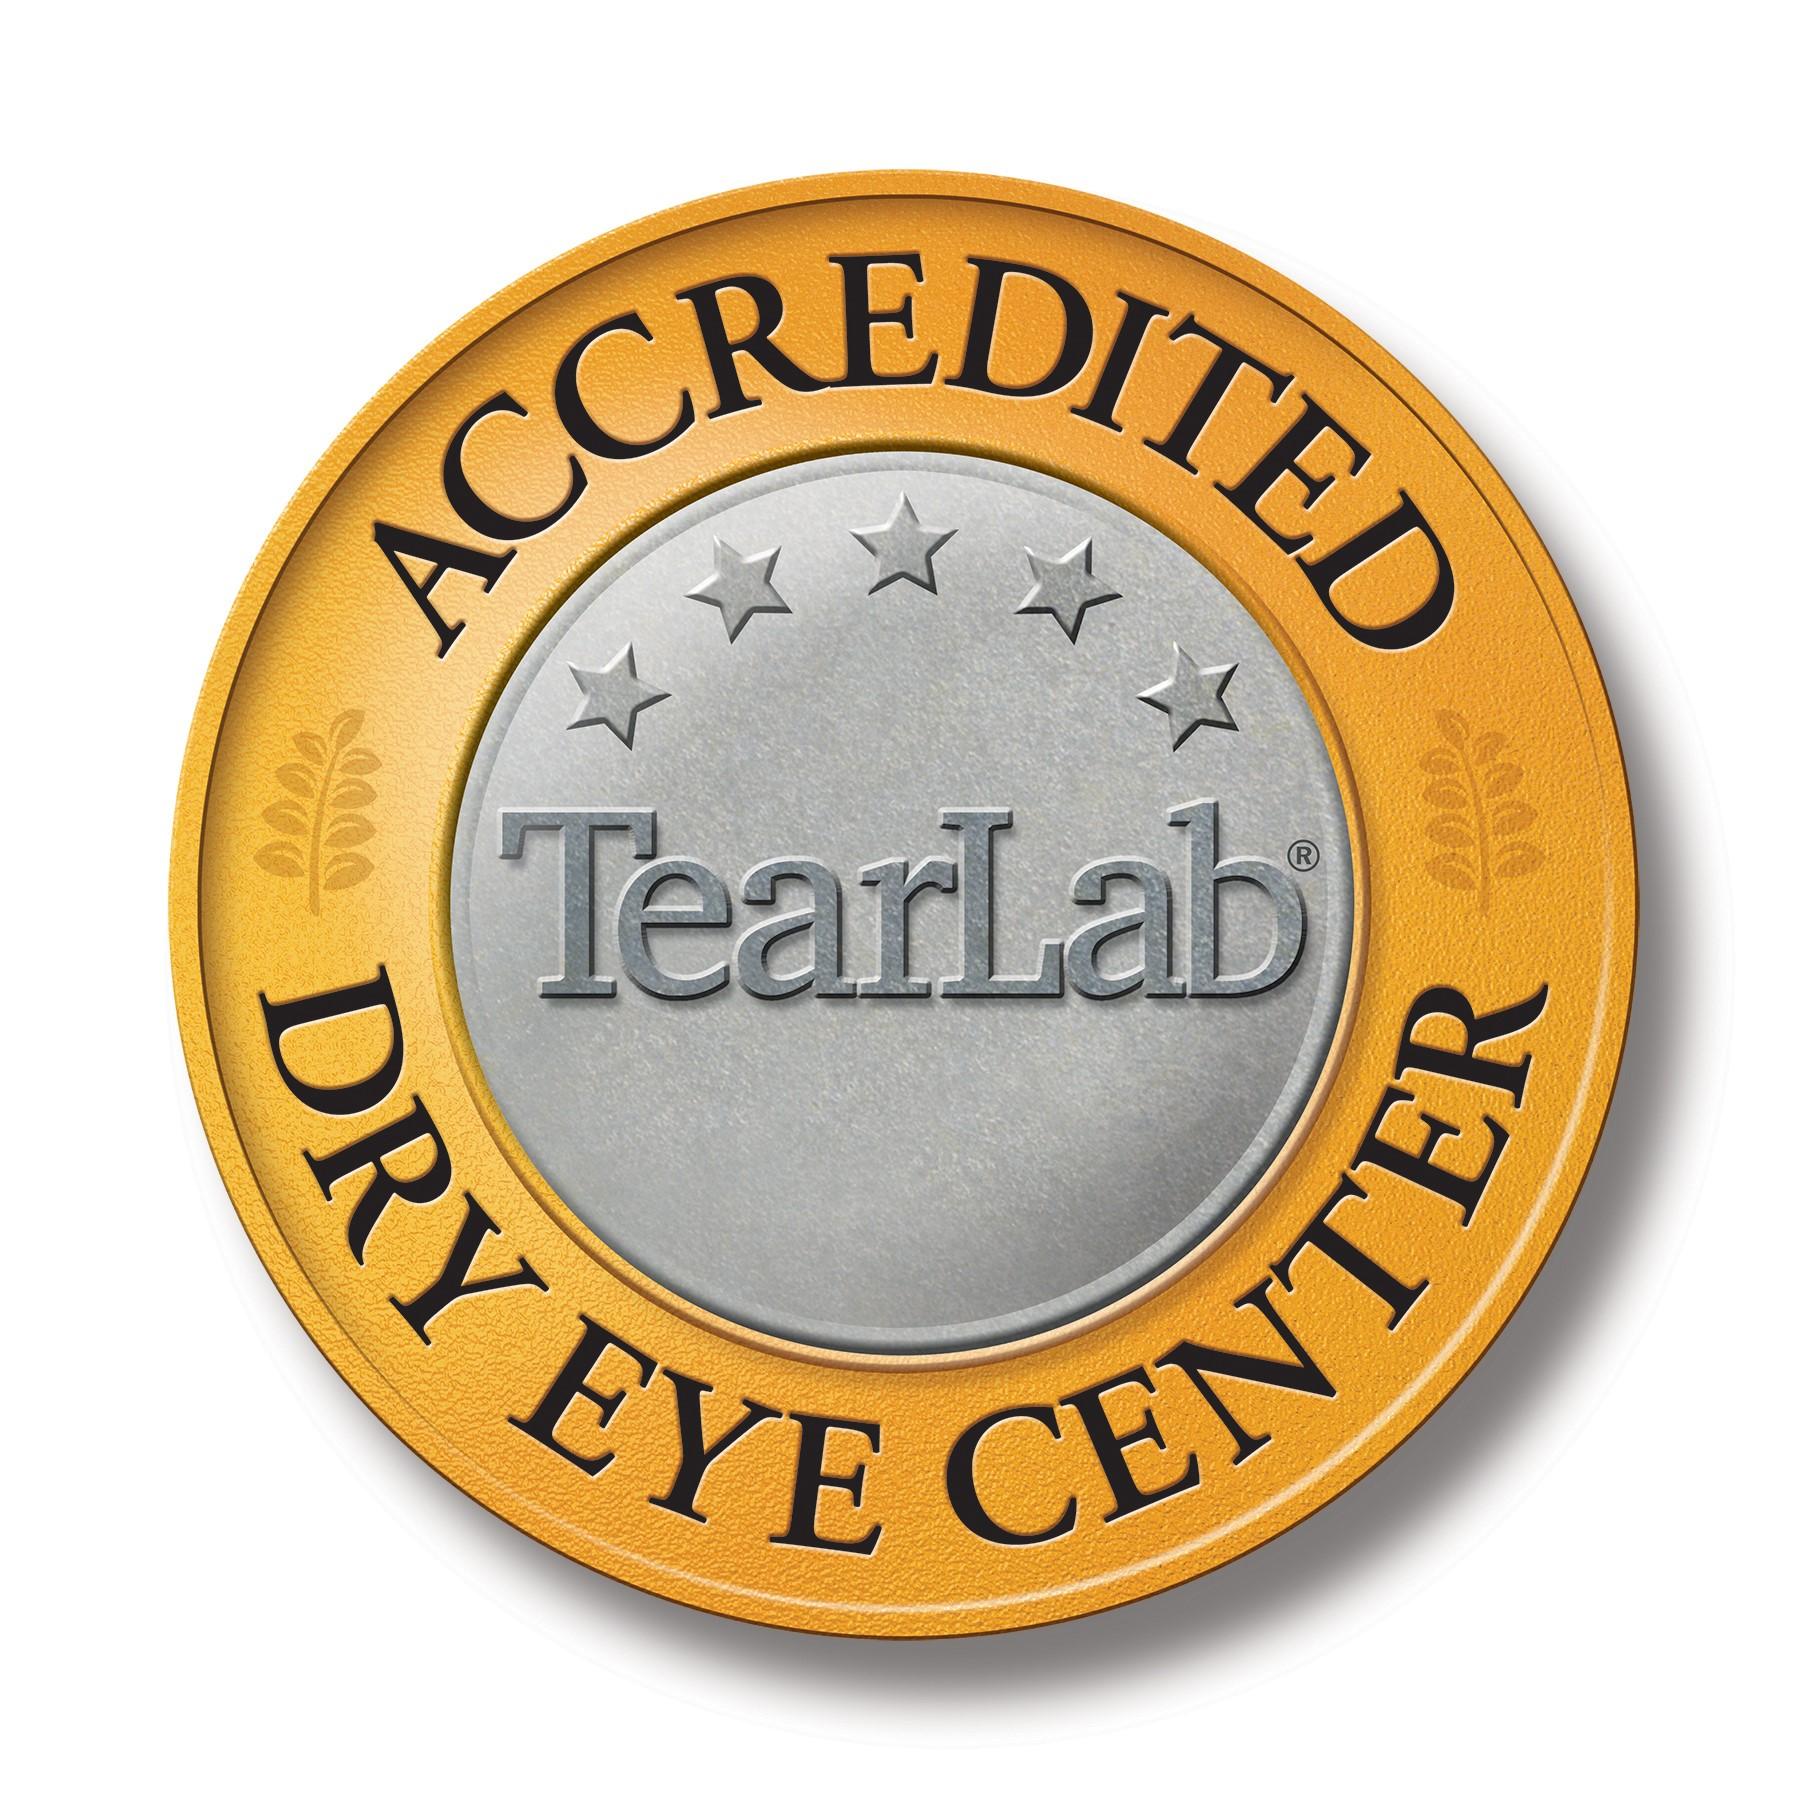 Accredited Dry Eye Center Seal.jpg